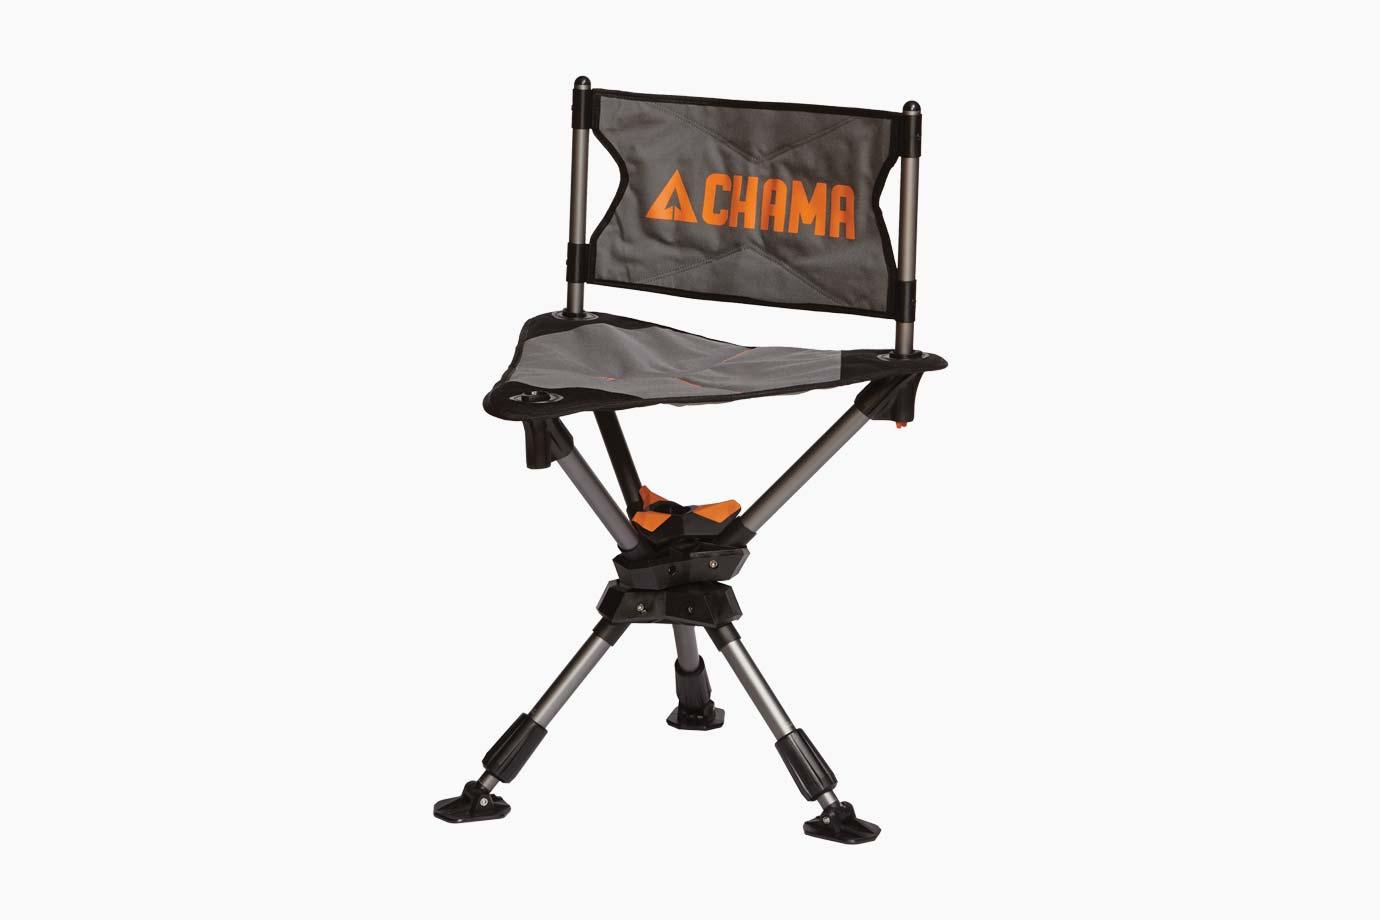 wolf grey chair - CHAMA Chairs